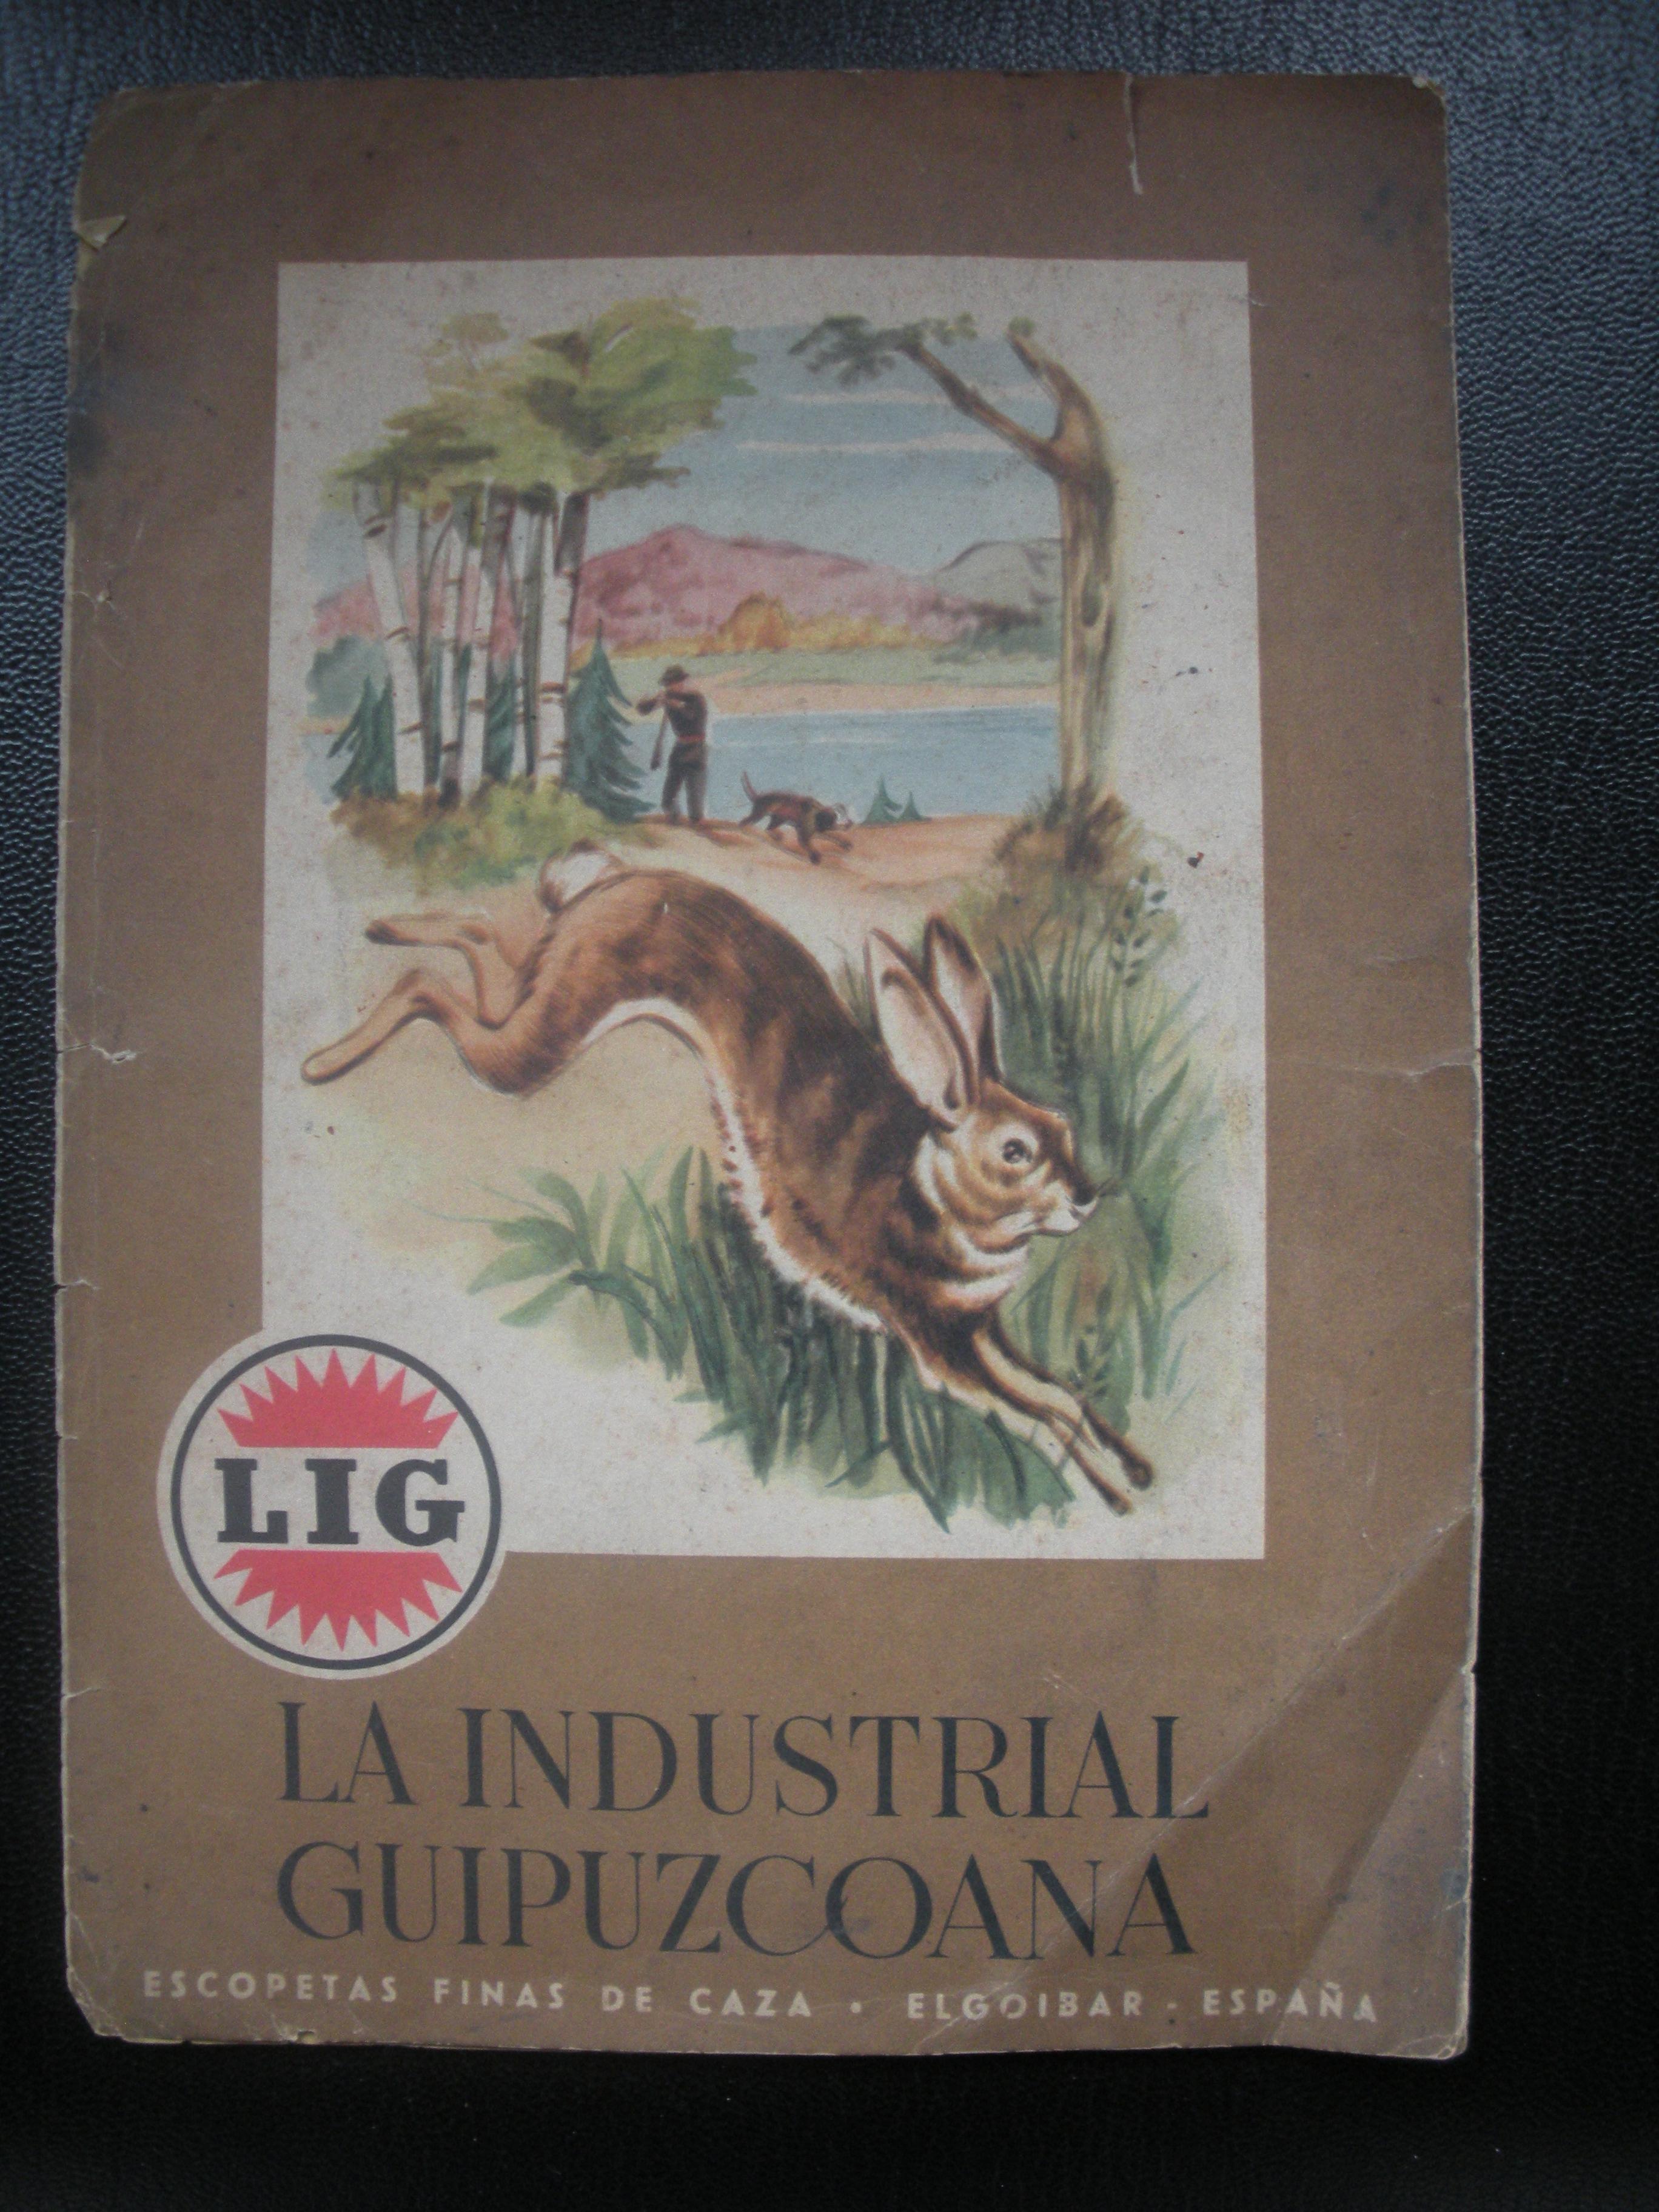 CATÁLOGO DE ESCOPETAS DE LA INDUSTRIAL GUIPUZCOANA (LIG)